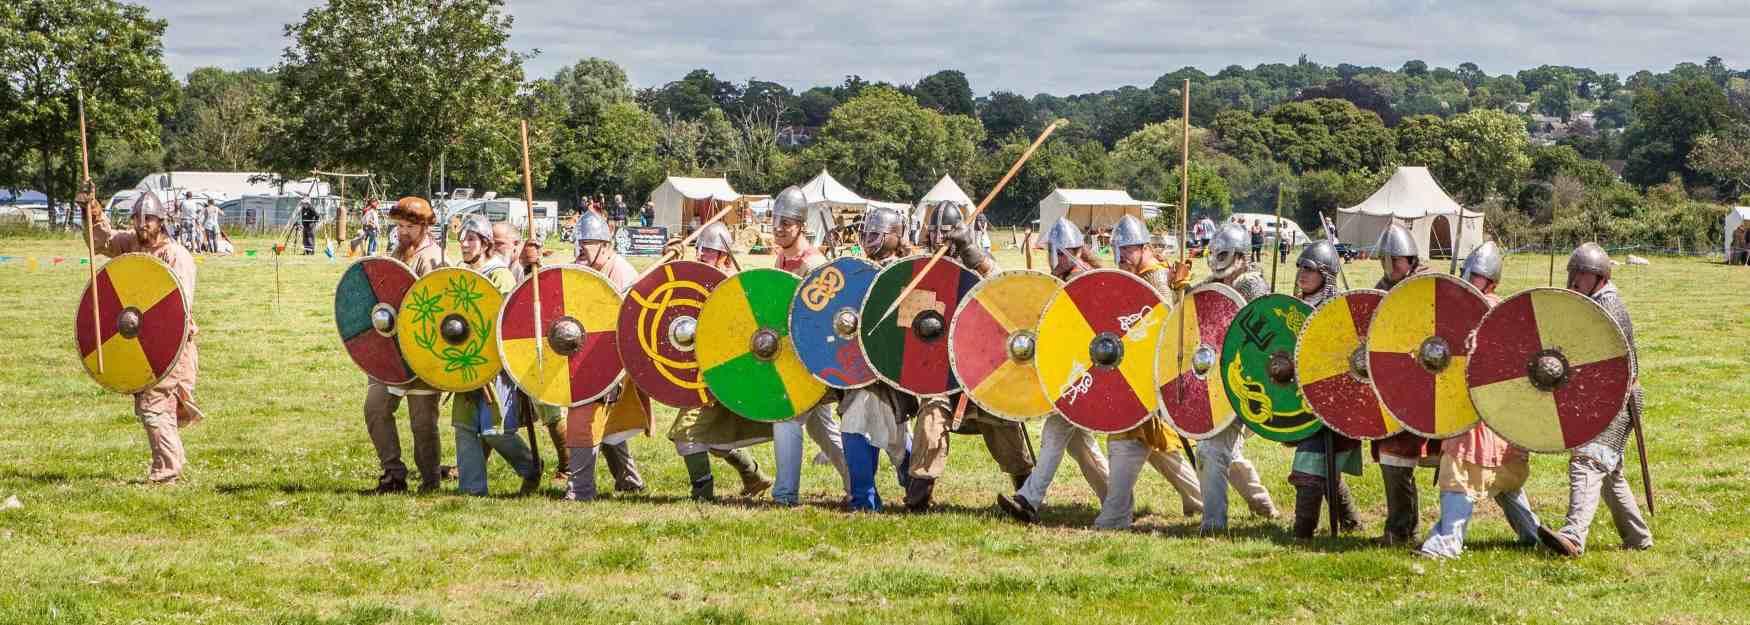 Viking charge © Paul Thackeray